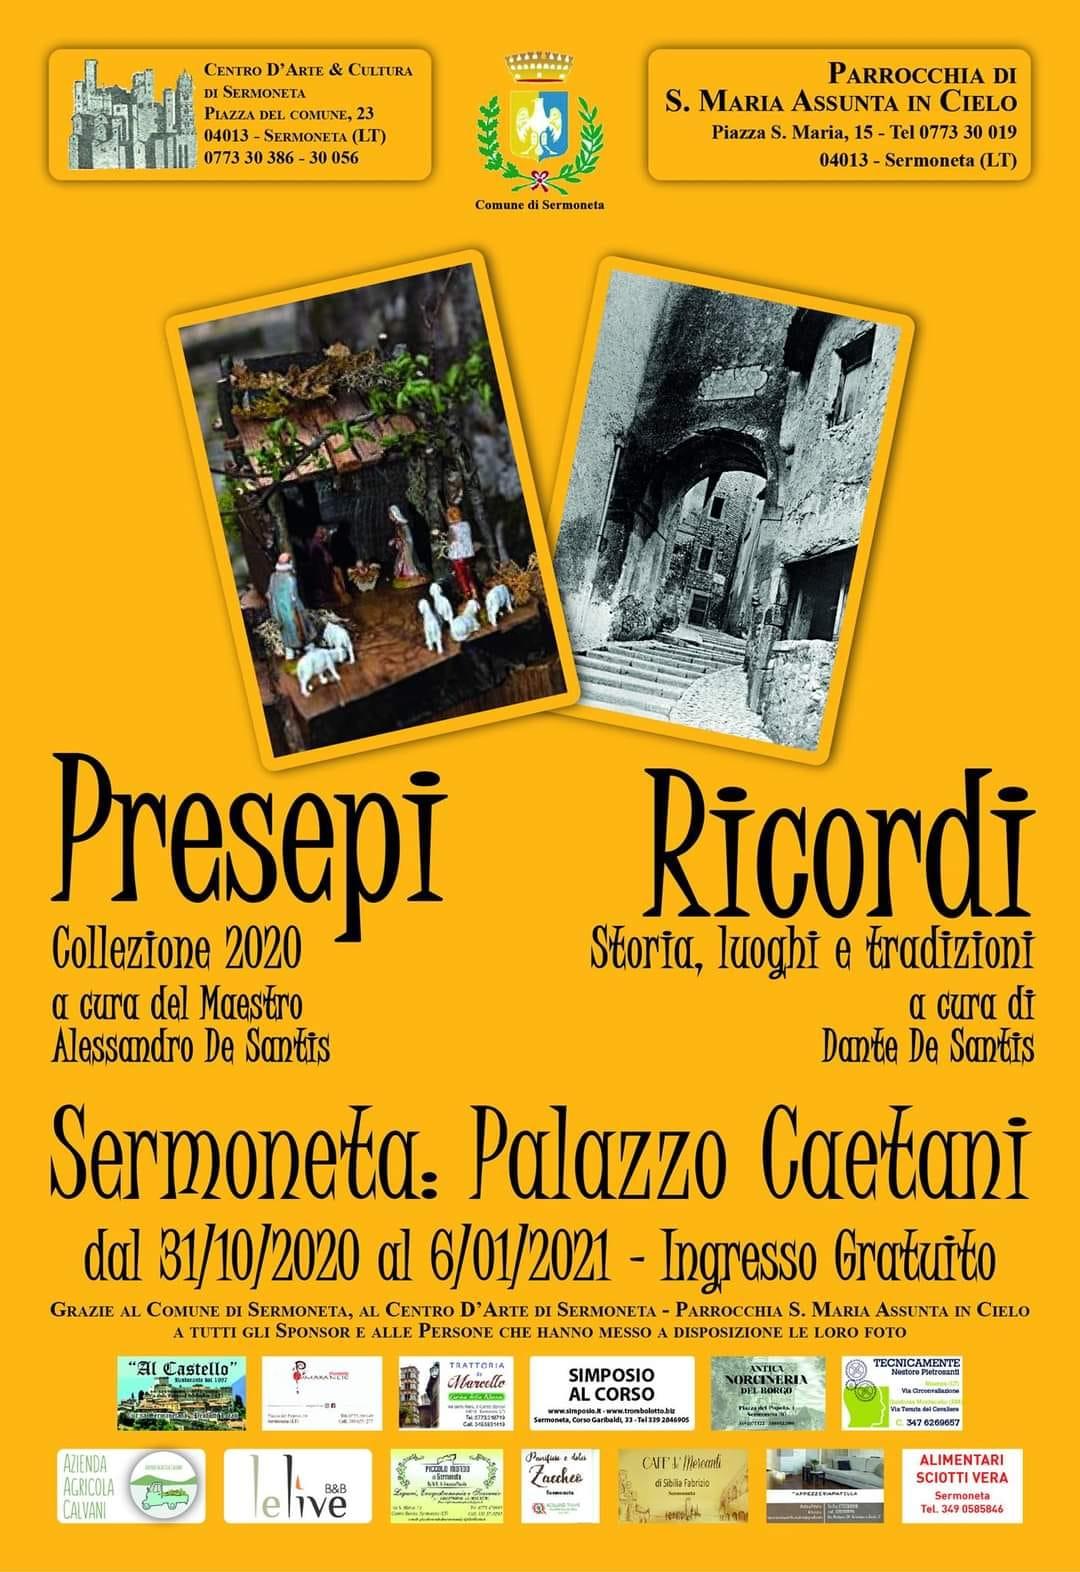 SERMONETA: PRESEPI RICORDI @ Sermoneta: Palazzo Caetani